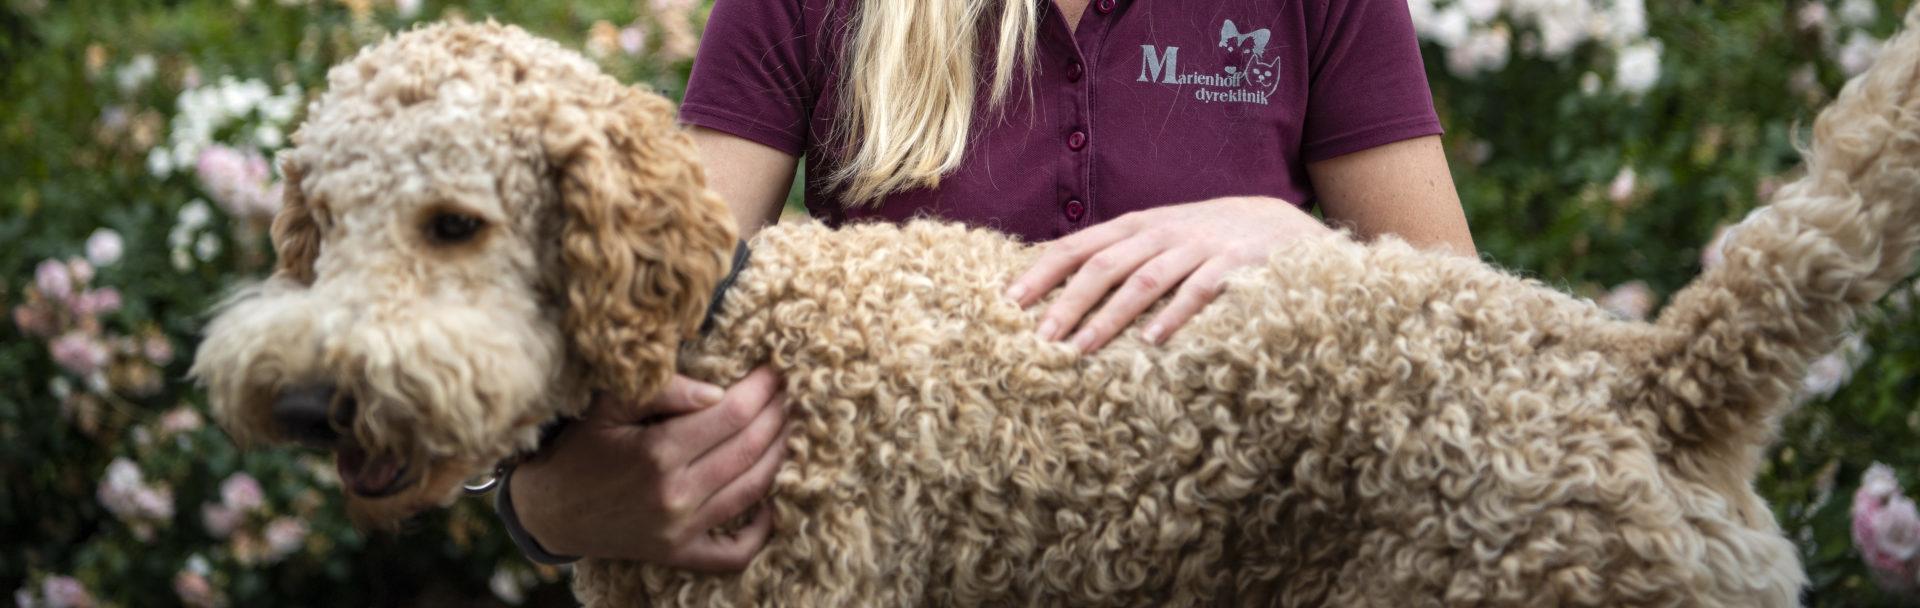 vaccination af hund marienhoff dyreklinik1 e1602752962103